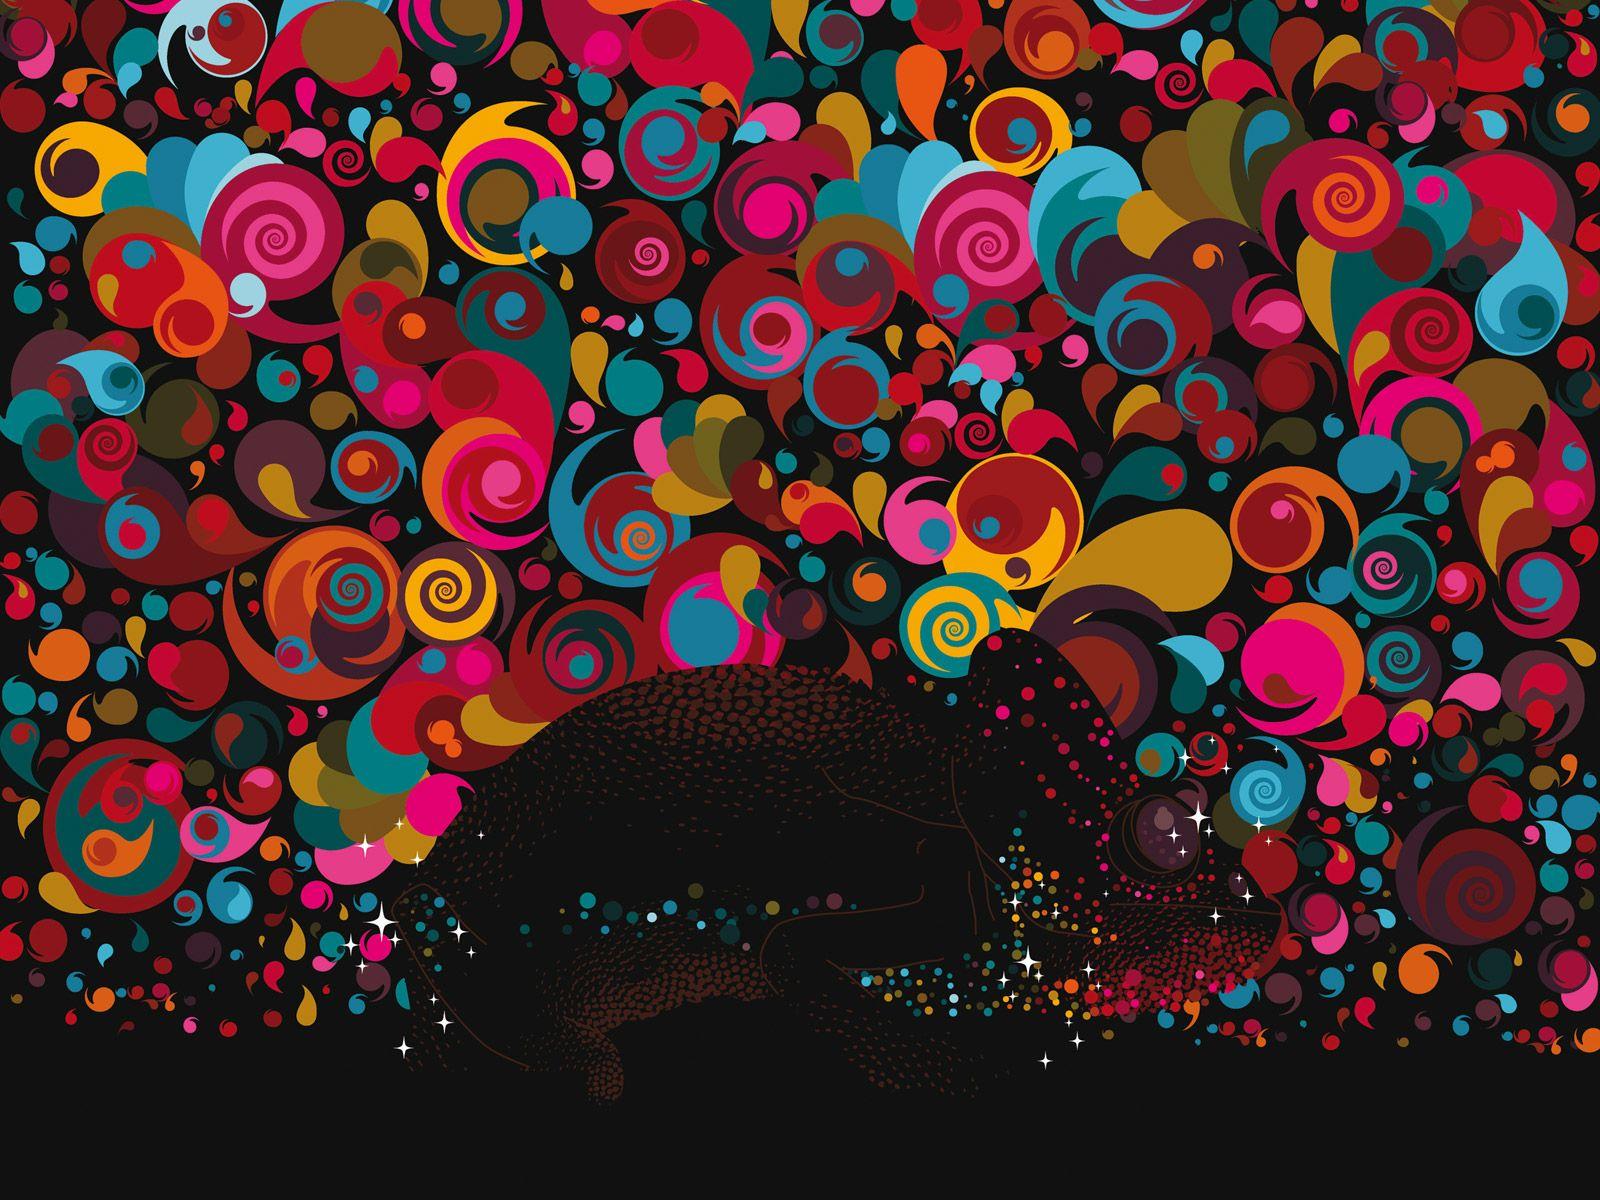 Cool Colorful Desktop Backgrounds